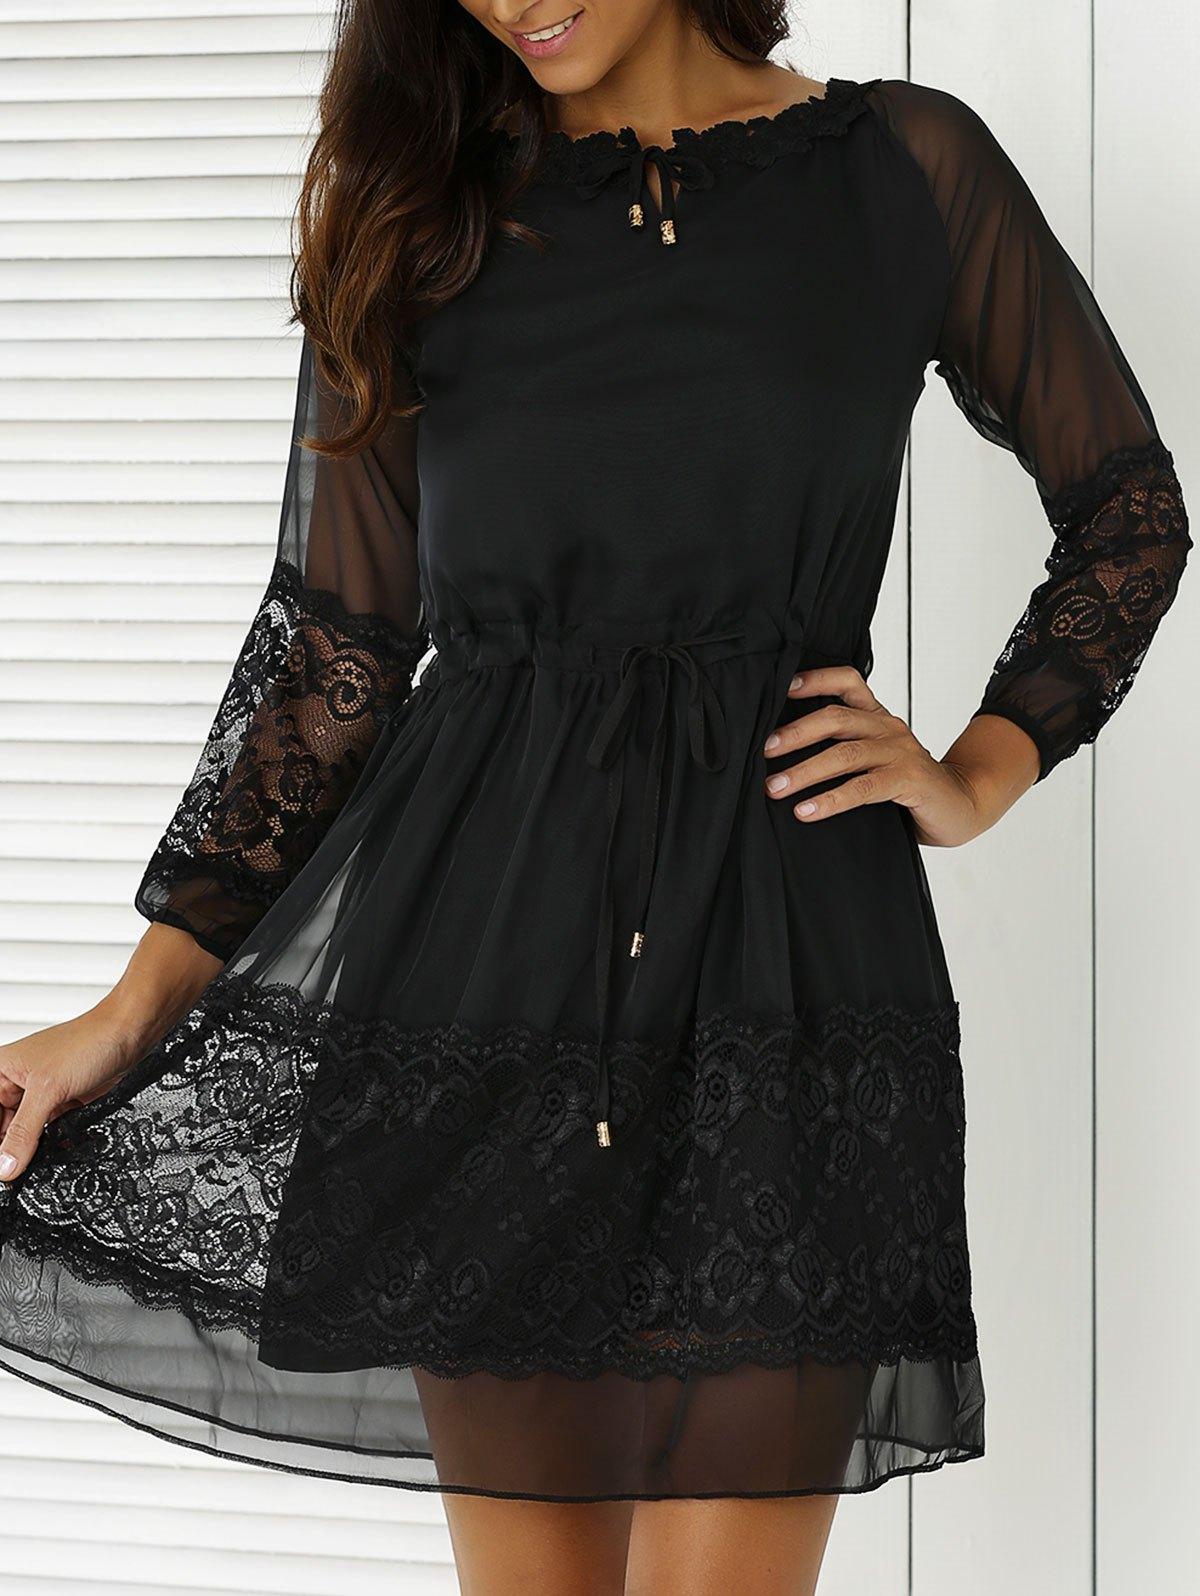 Round Neck 3/4 Sleeve Lace Splice Black Dress